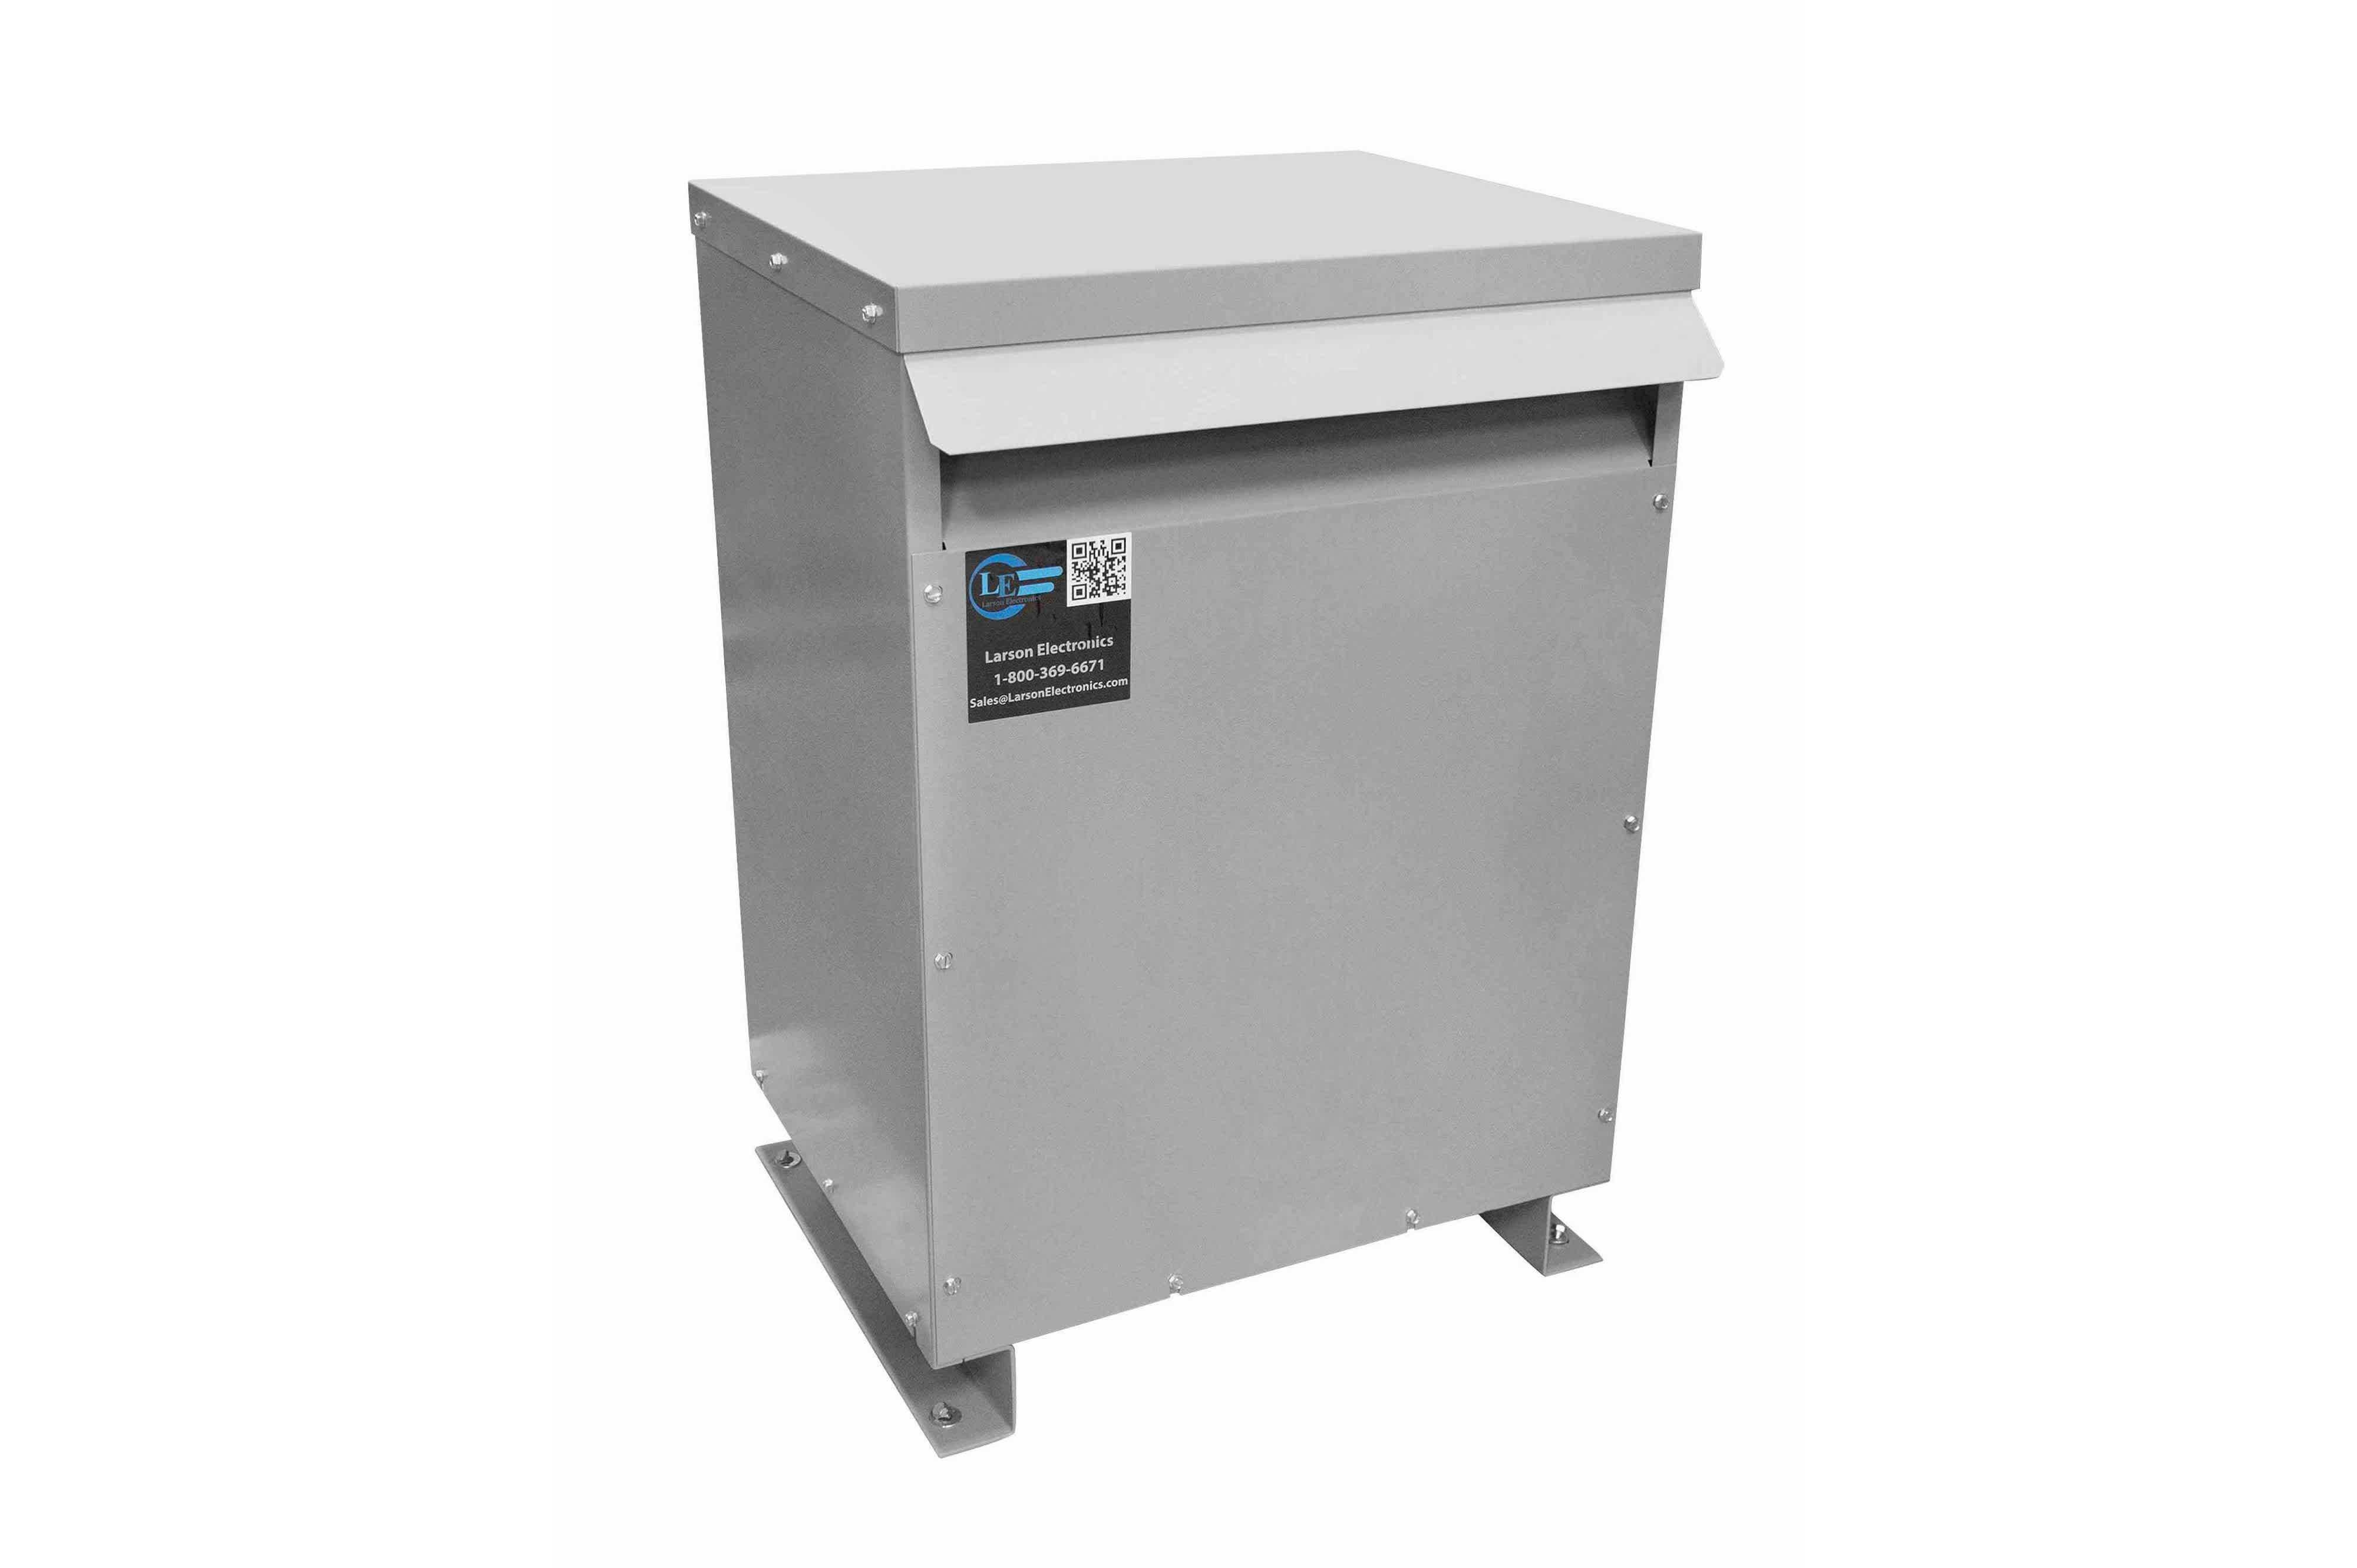 9 kVA 3PH Isolation Transformer, 575V Wye Primary, 480V Delta Secondary, N3R, Ventilated, 60 Hz